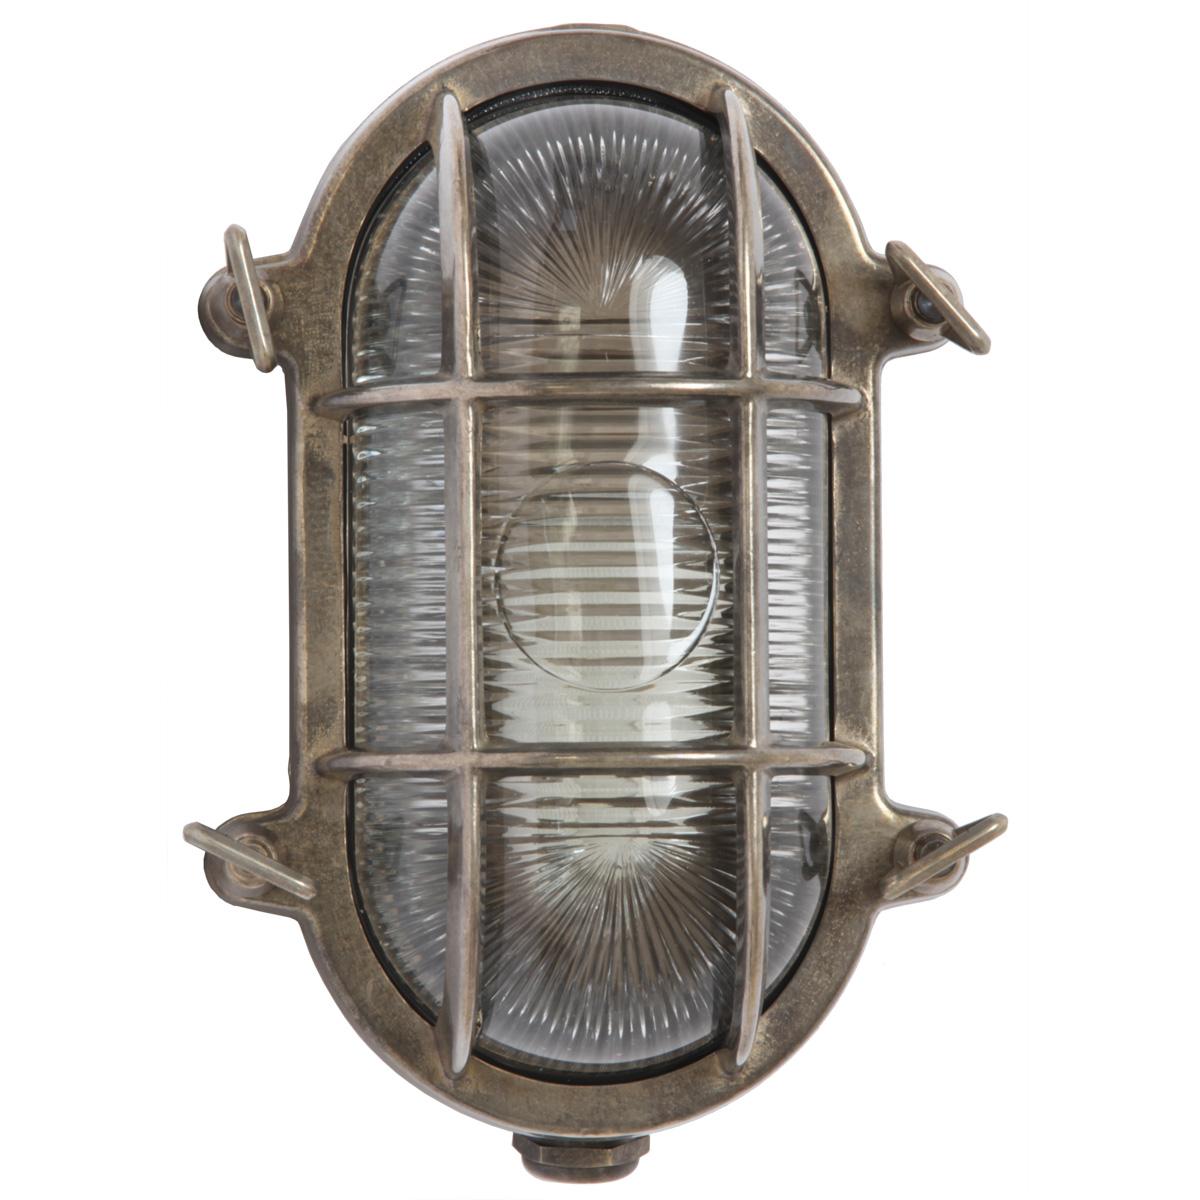 Maritime Beleuchtung schiffsleuchten maritime klassiker für bäder keller und nassräume